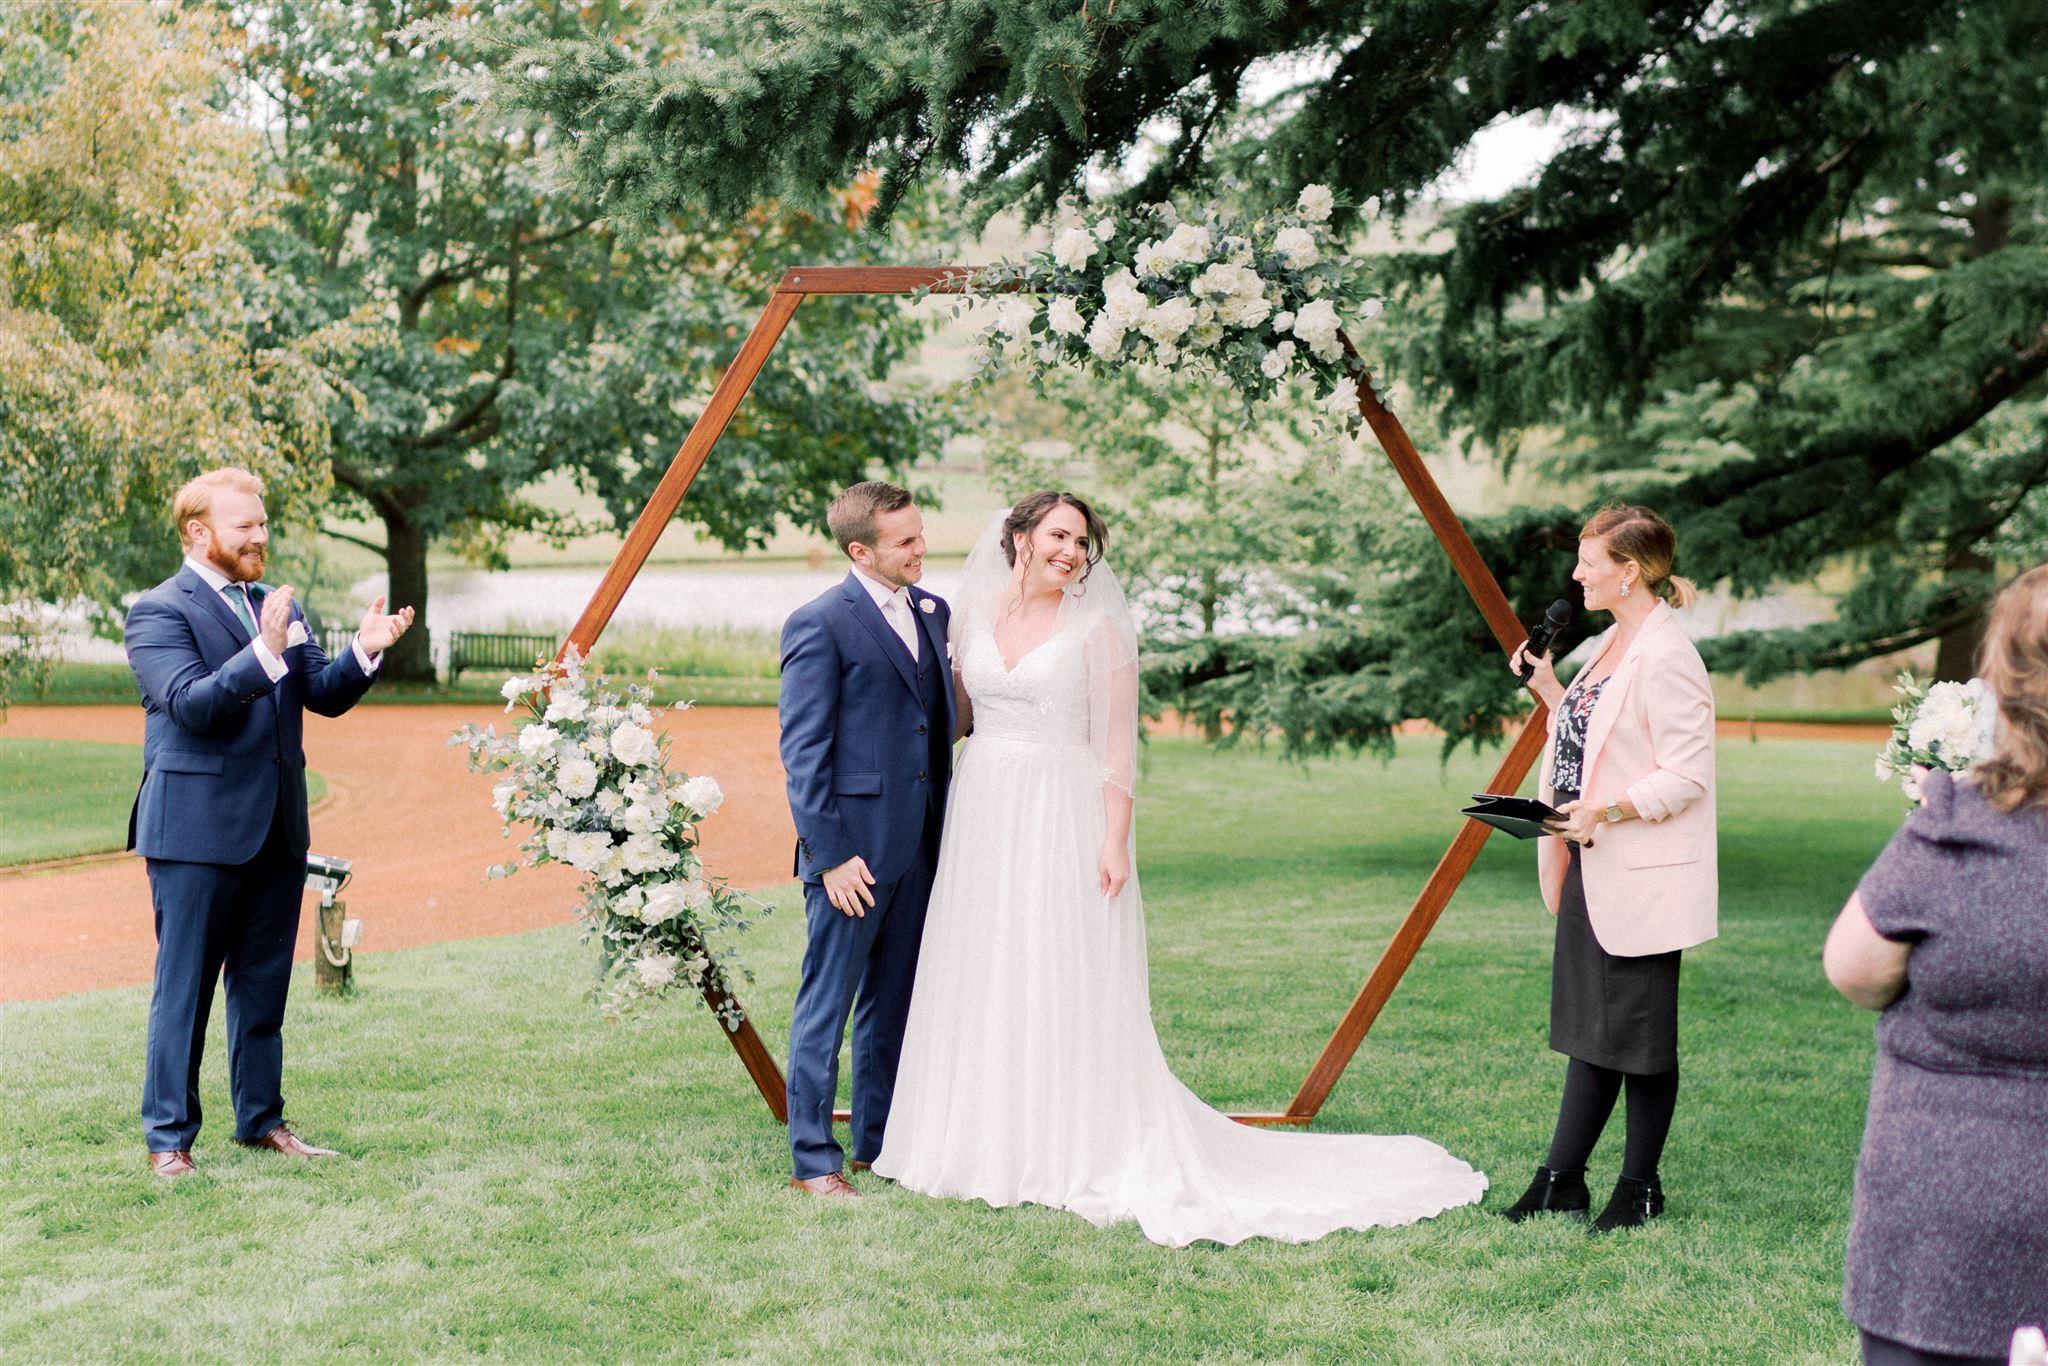 weareorigami-jess&ben-wedding-0453_websize.jpg